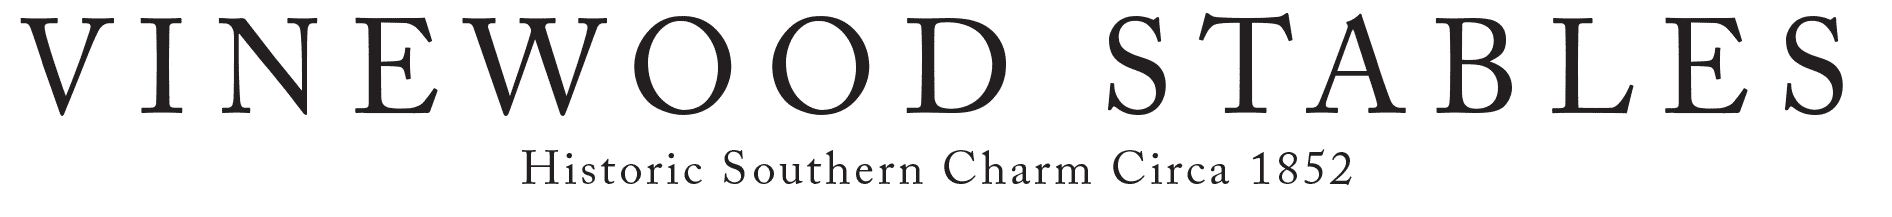 Vinewood_Stables_Web_Logo.png